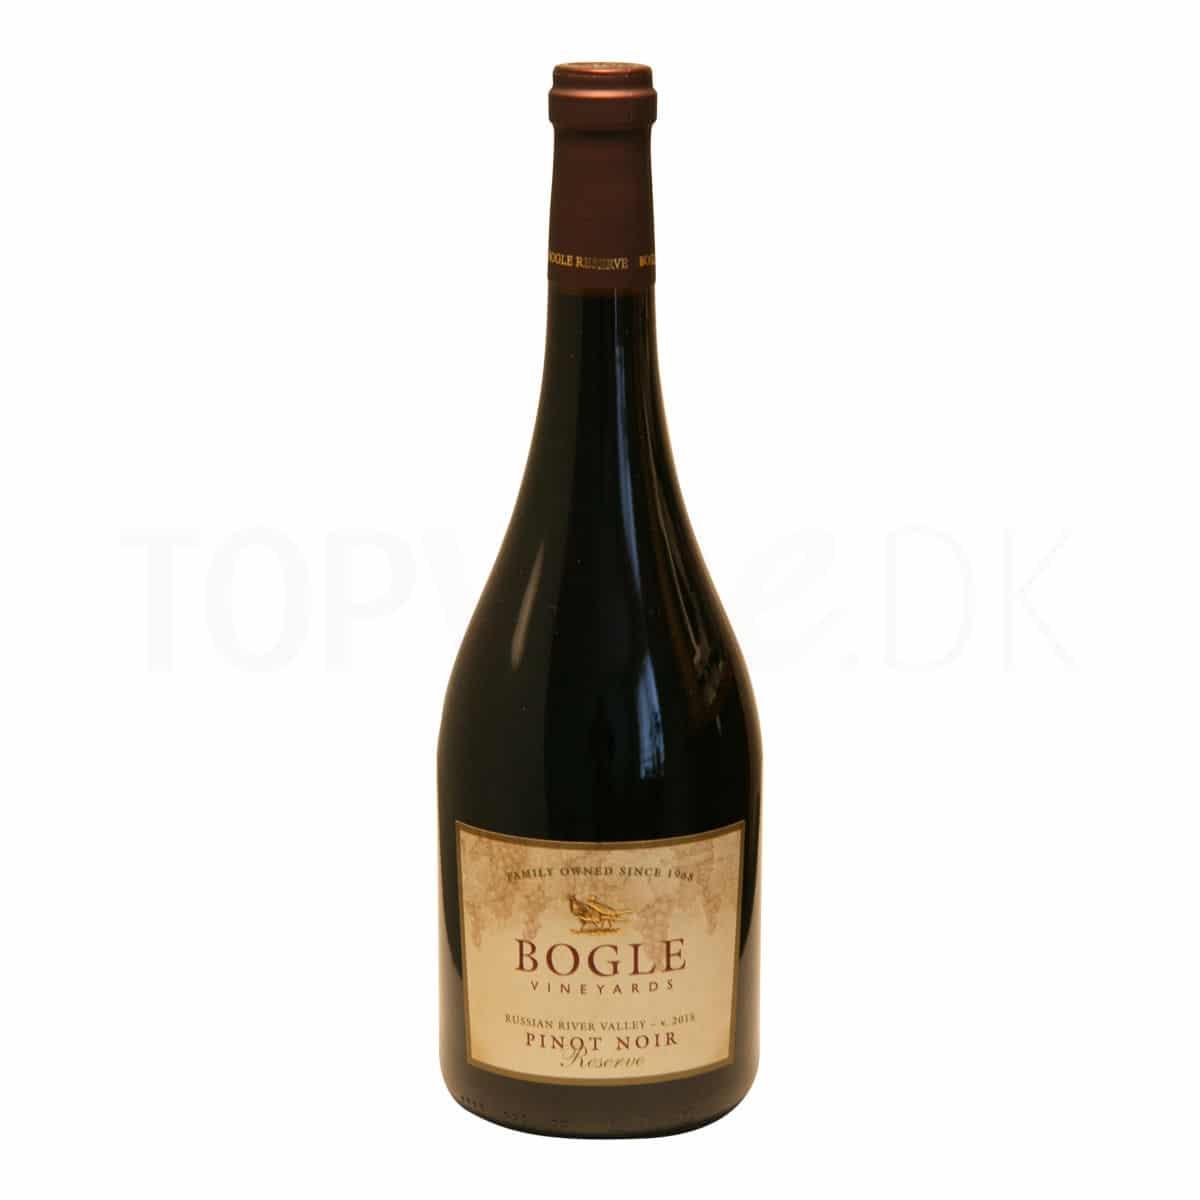 Topvine Bogle Pinot Noir Russian River 2015